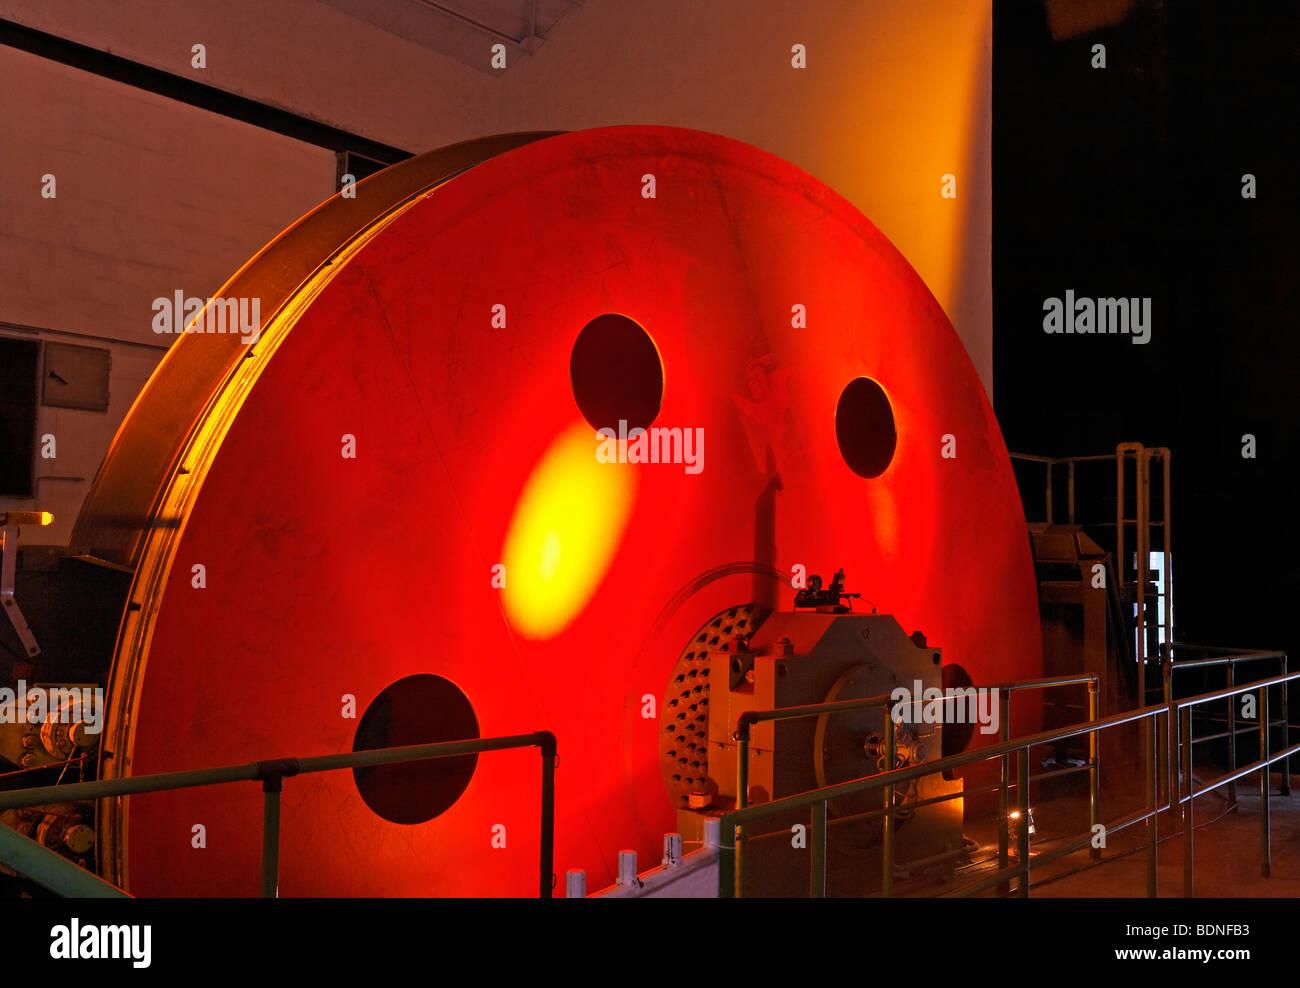 Hoisting machine, illuminated, disused mine Zeche Lohberg, ExtraSchicht 2009 festival, Dinslaken, Ruhrgebiet region, - Stock Image